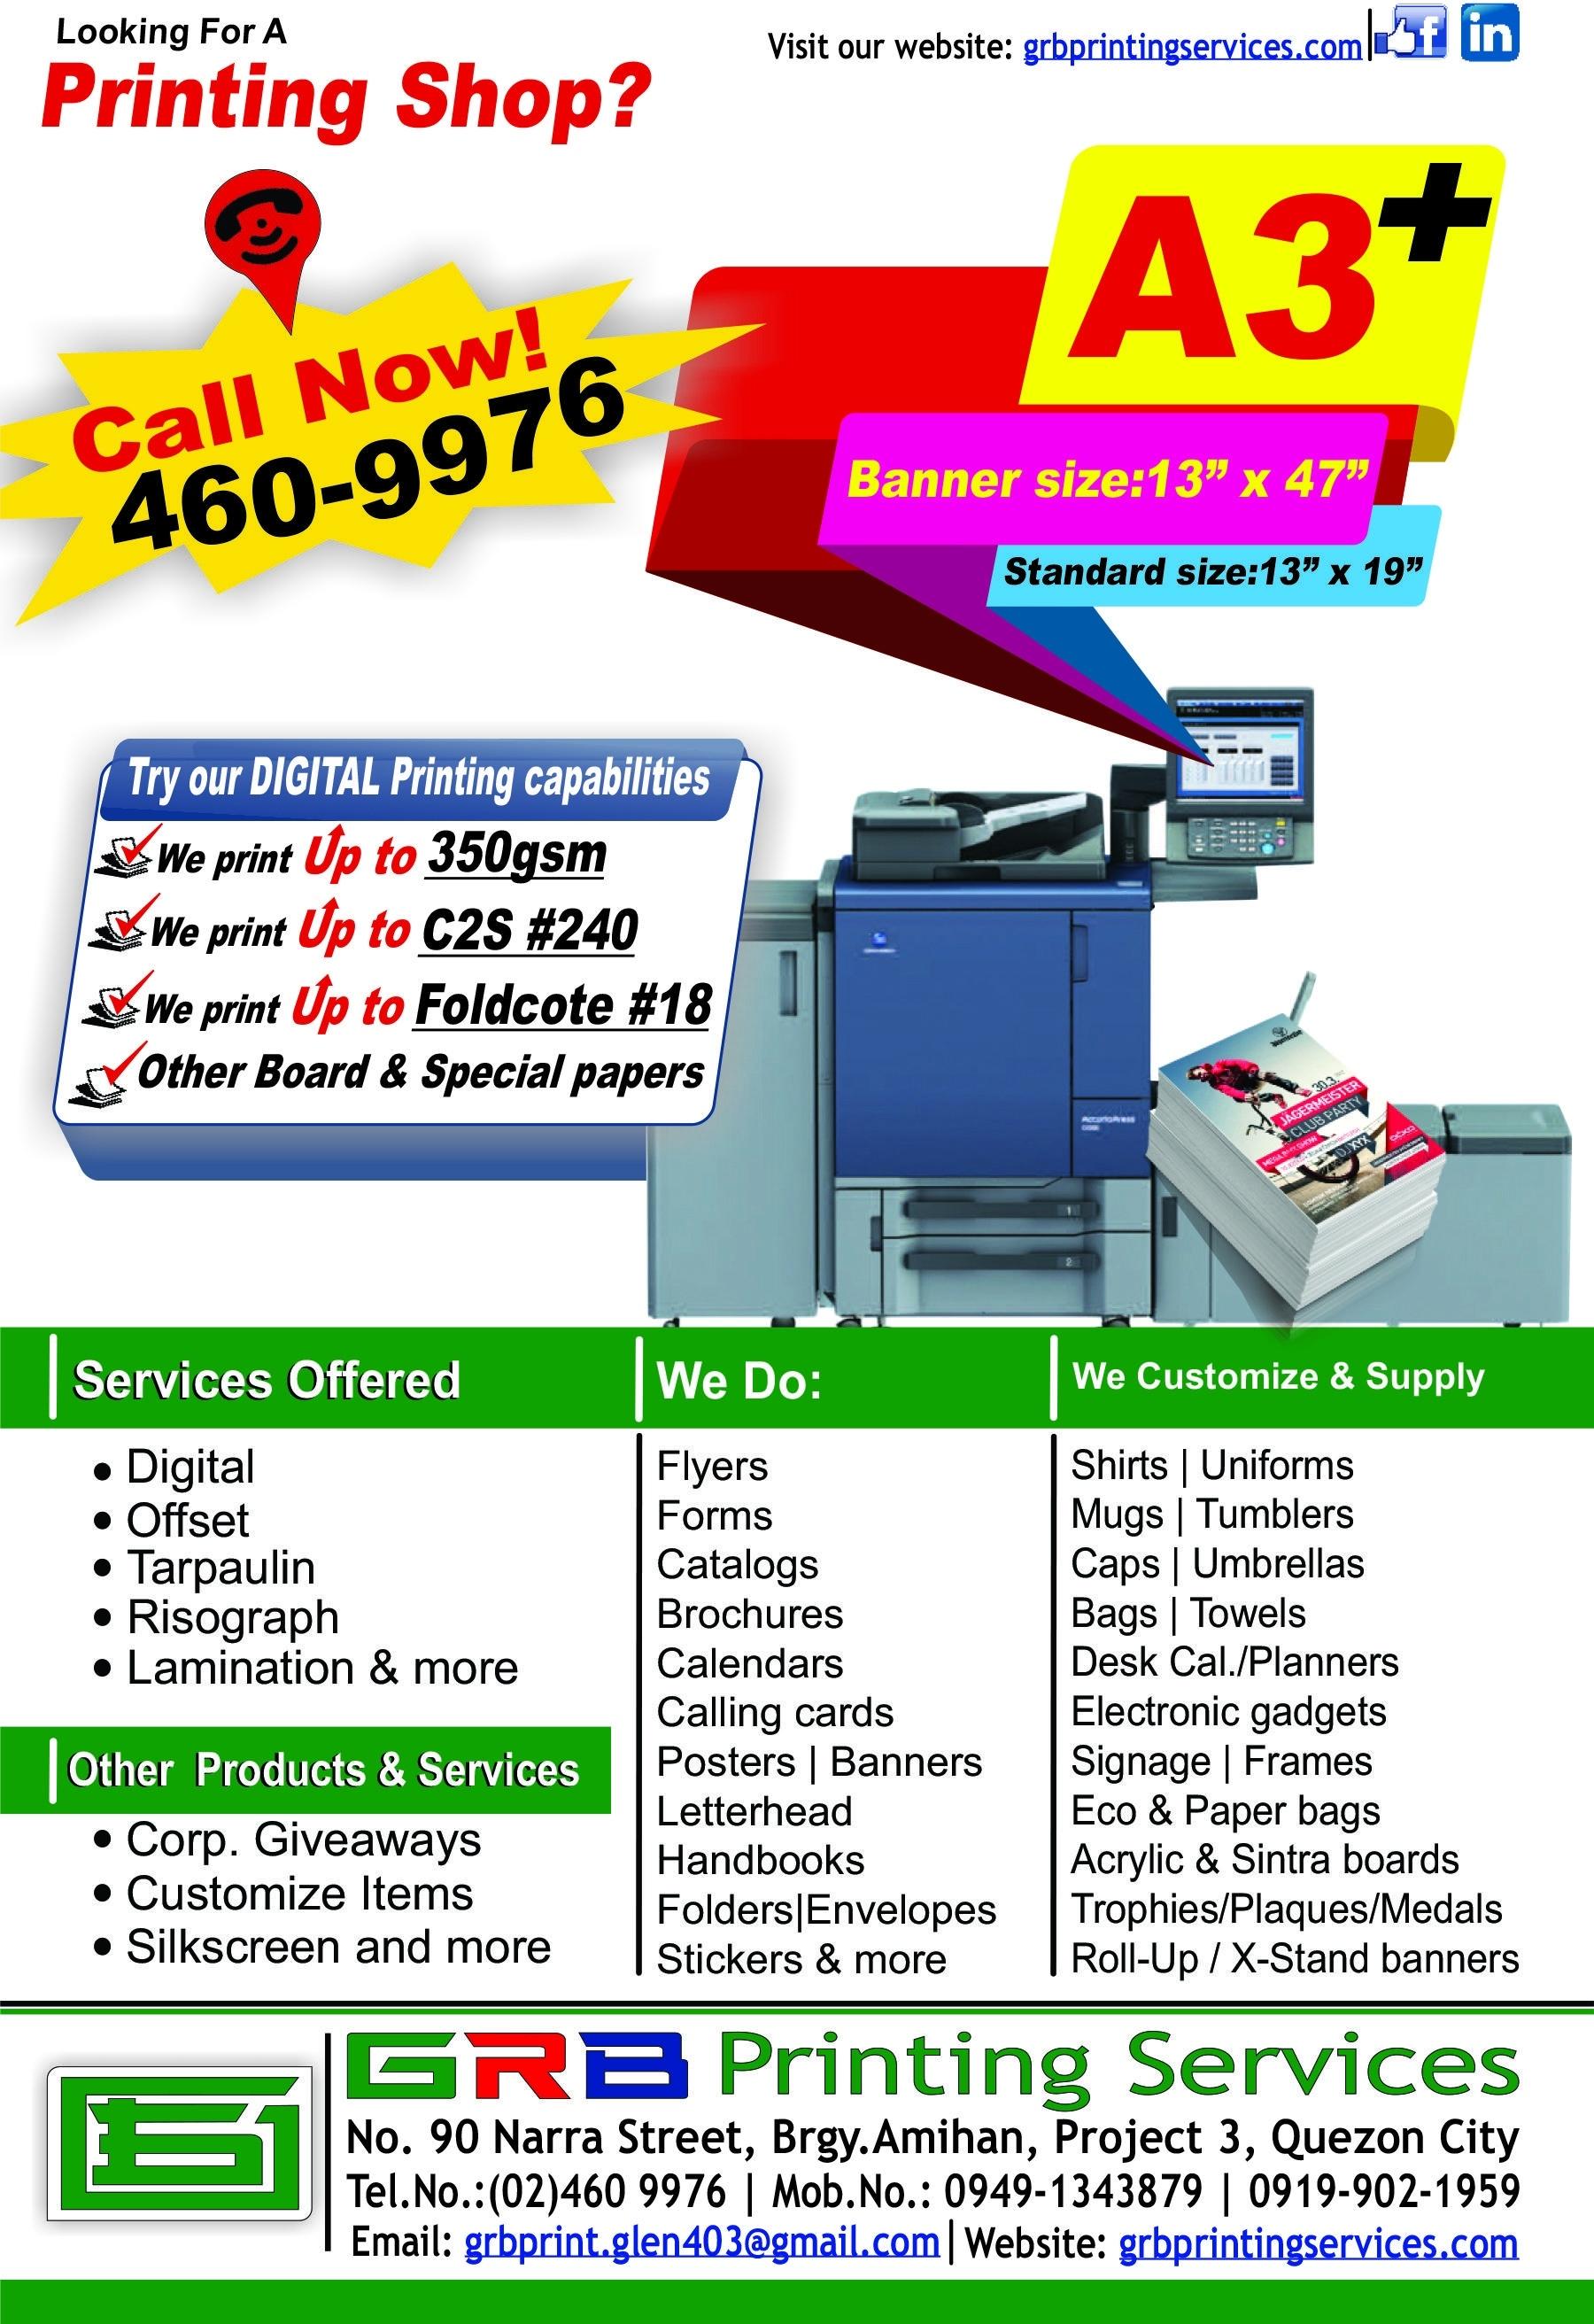 Glen Dela Rosa Bensurto - Owner / Proprietor - Grb Printing Services Calendar Printing In Quezon City